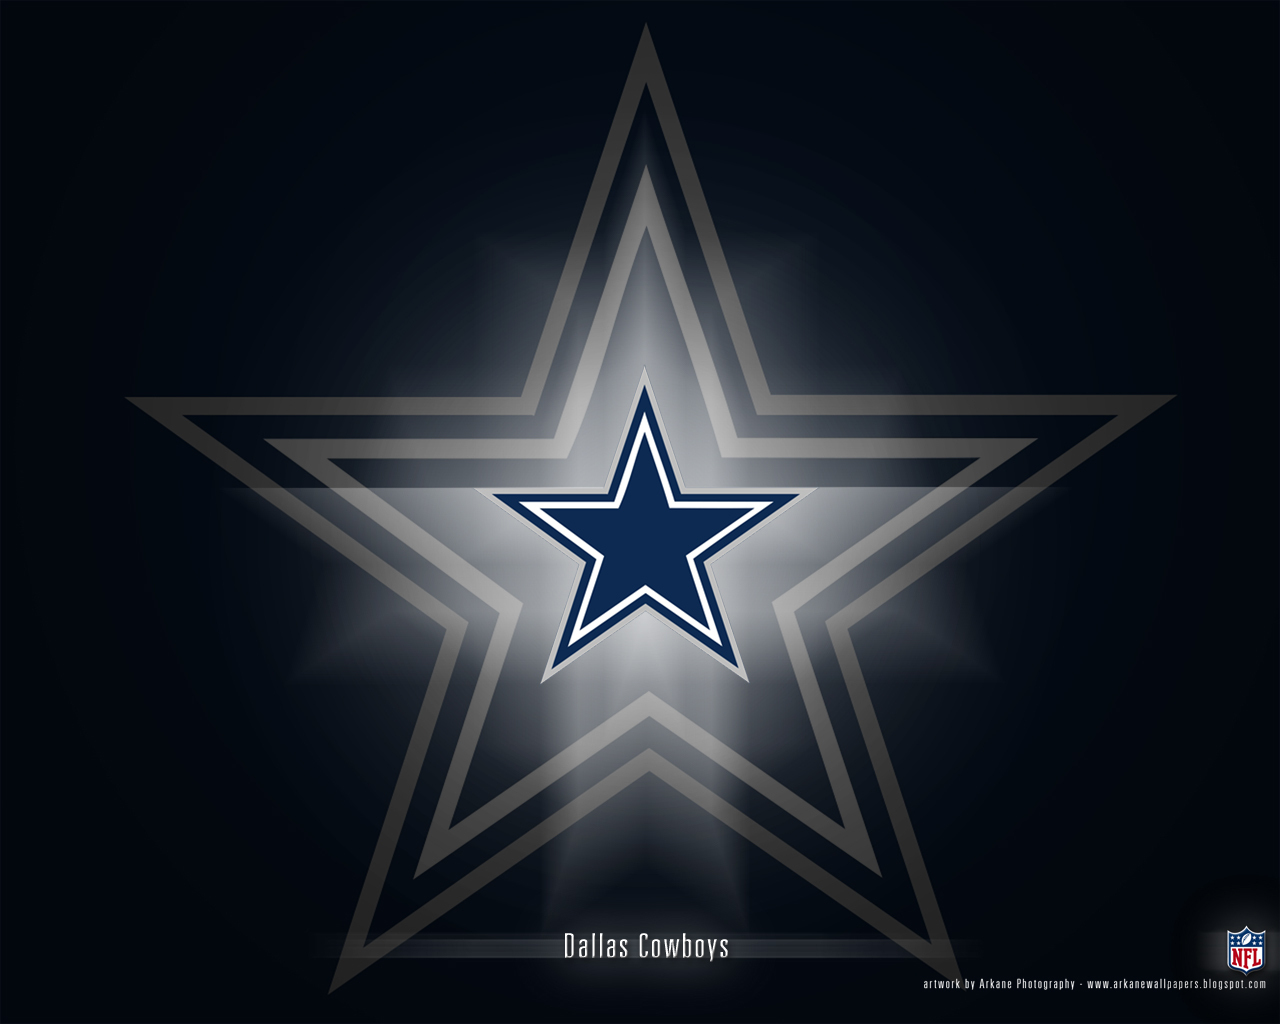 HD Wallpapers 1366x768 Dallas Cowboys  WallpaperSafari